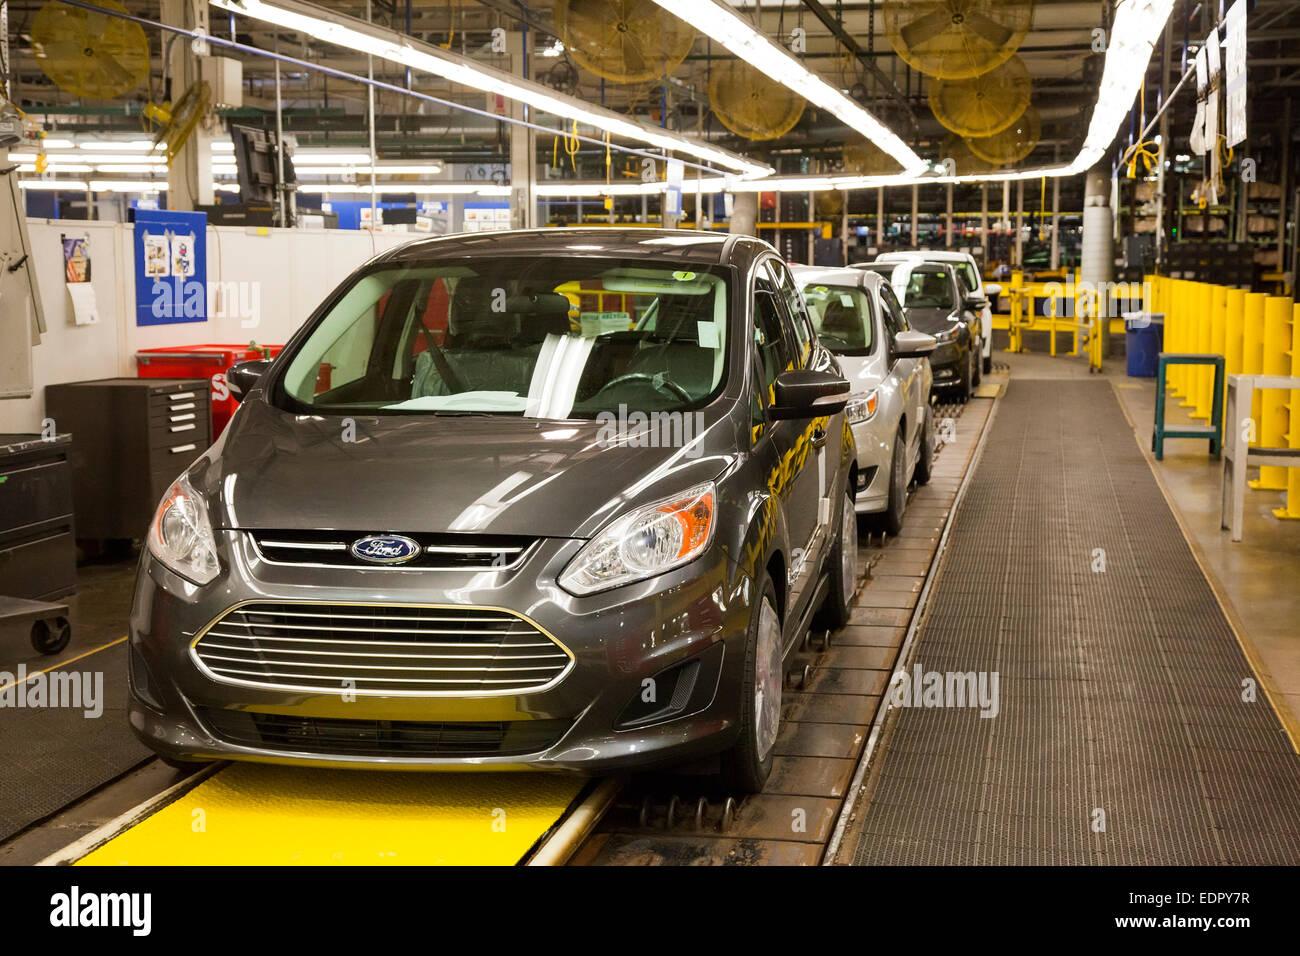 Wayne, Michigan - The Ford C-Max Hybrid at Ford's Michigan Assembly Plant. - Stock Image